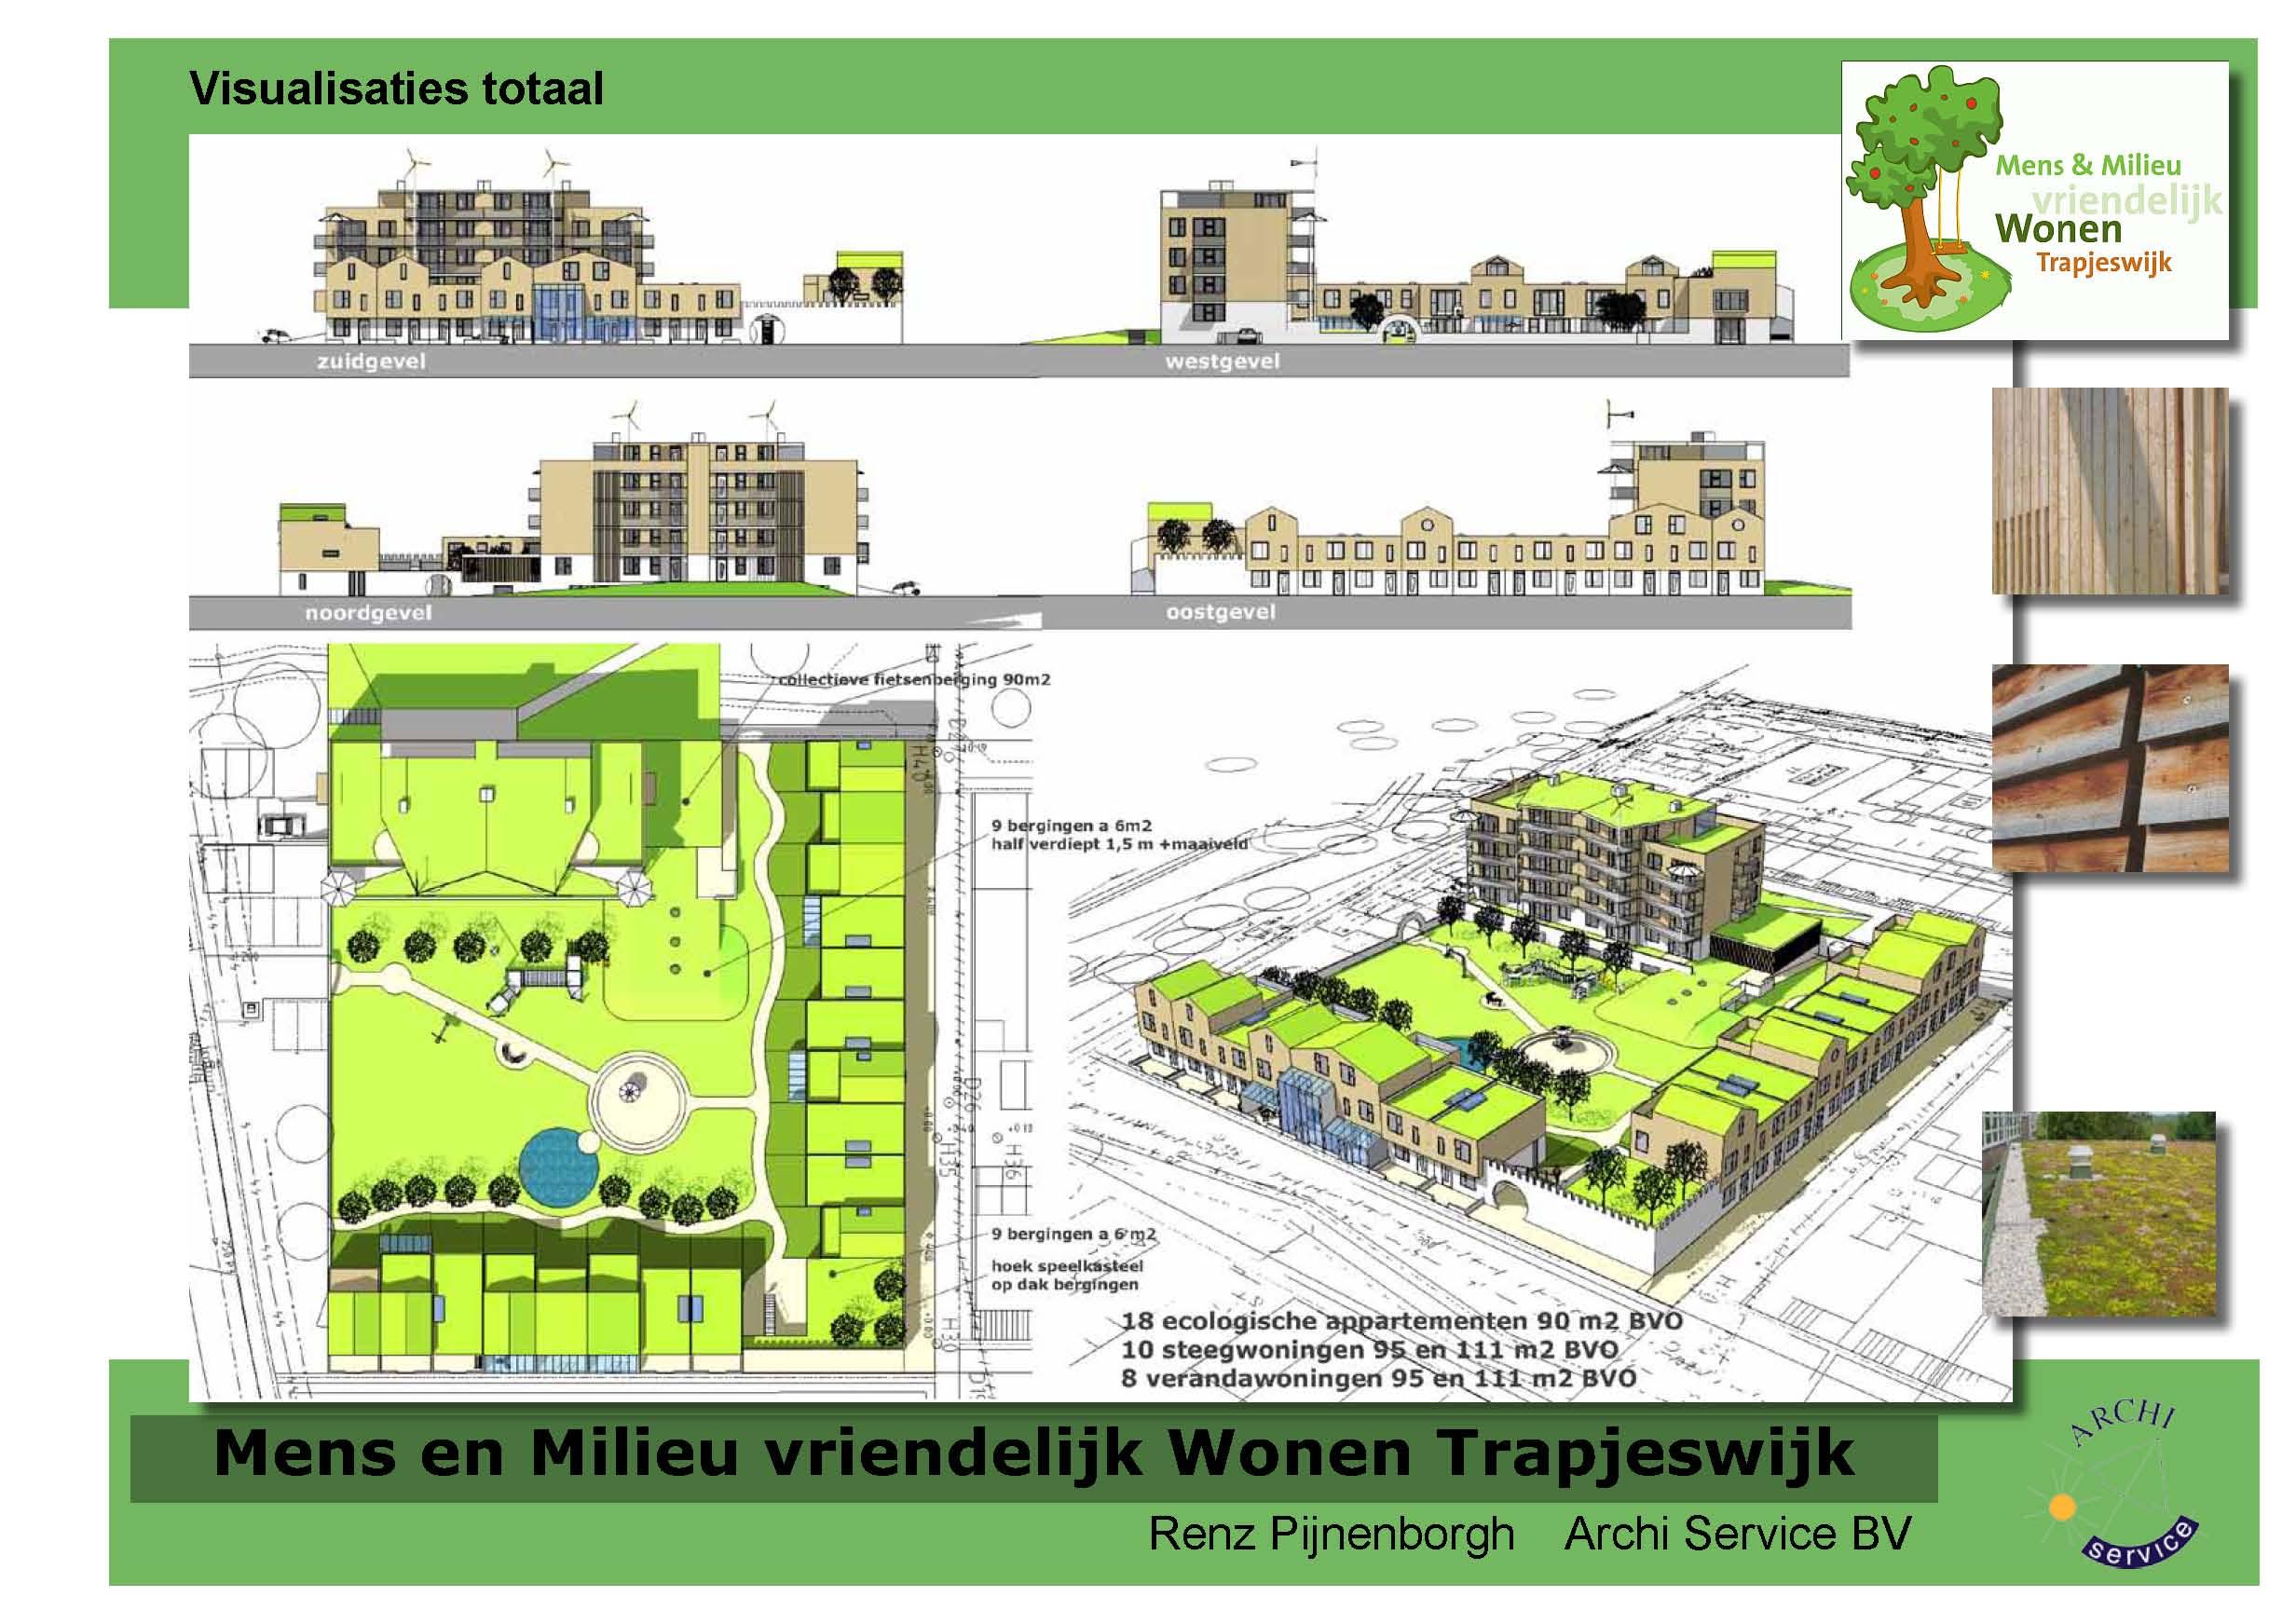 CPO trapjes wijk Zwolle